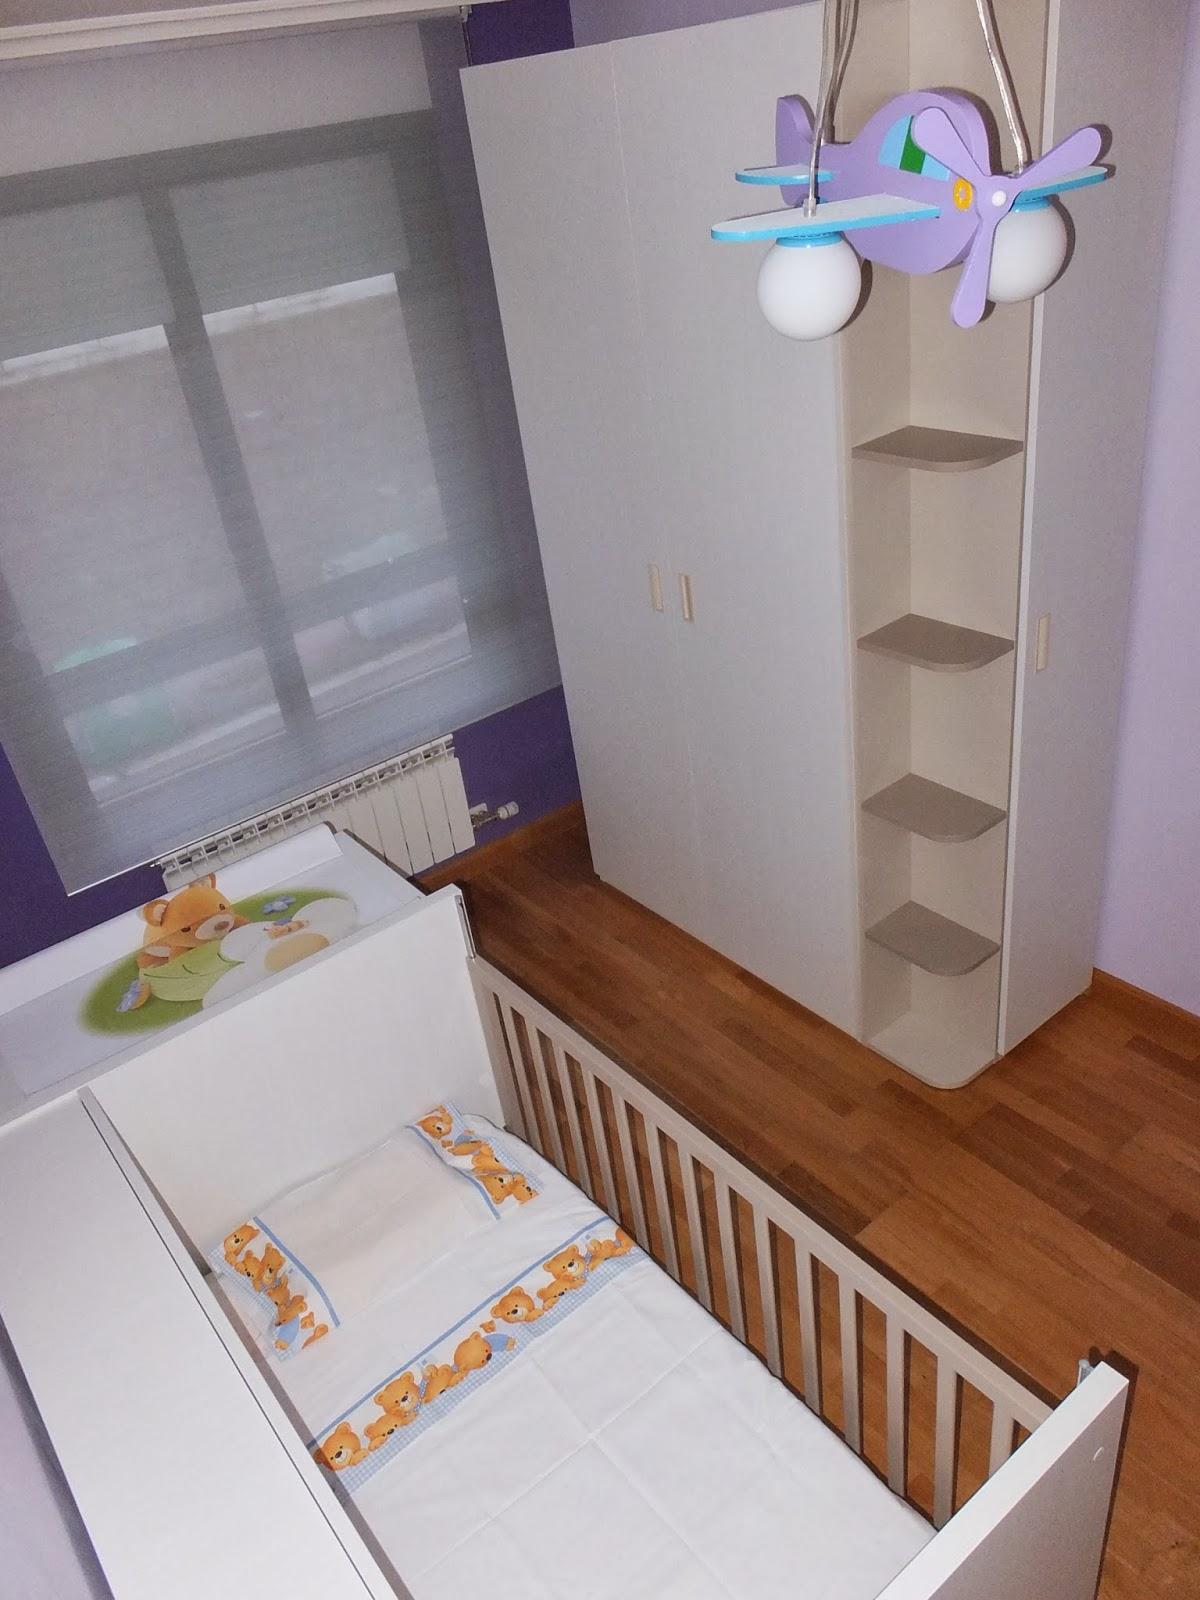 Muebles ros jorge v tore ganador de la ltima habitaci n - Mueble habitacion infantil ...